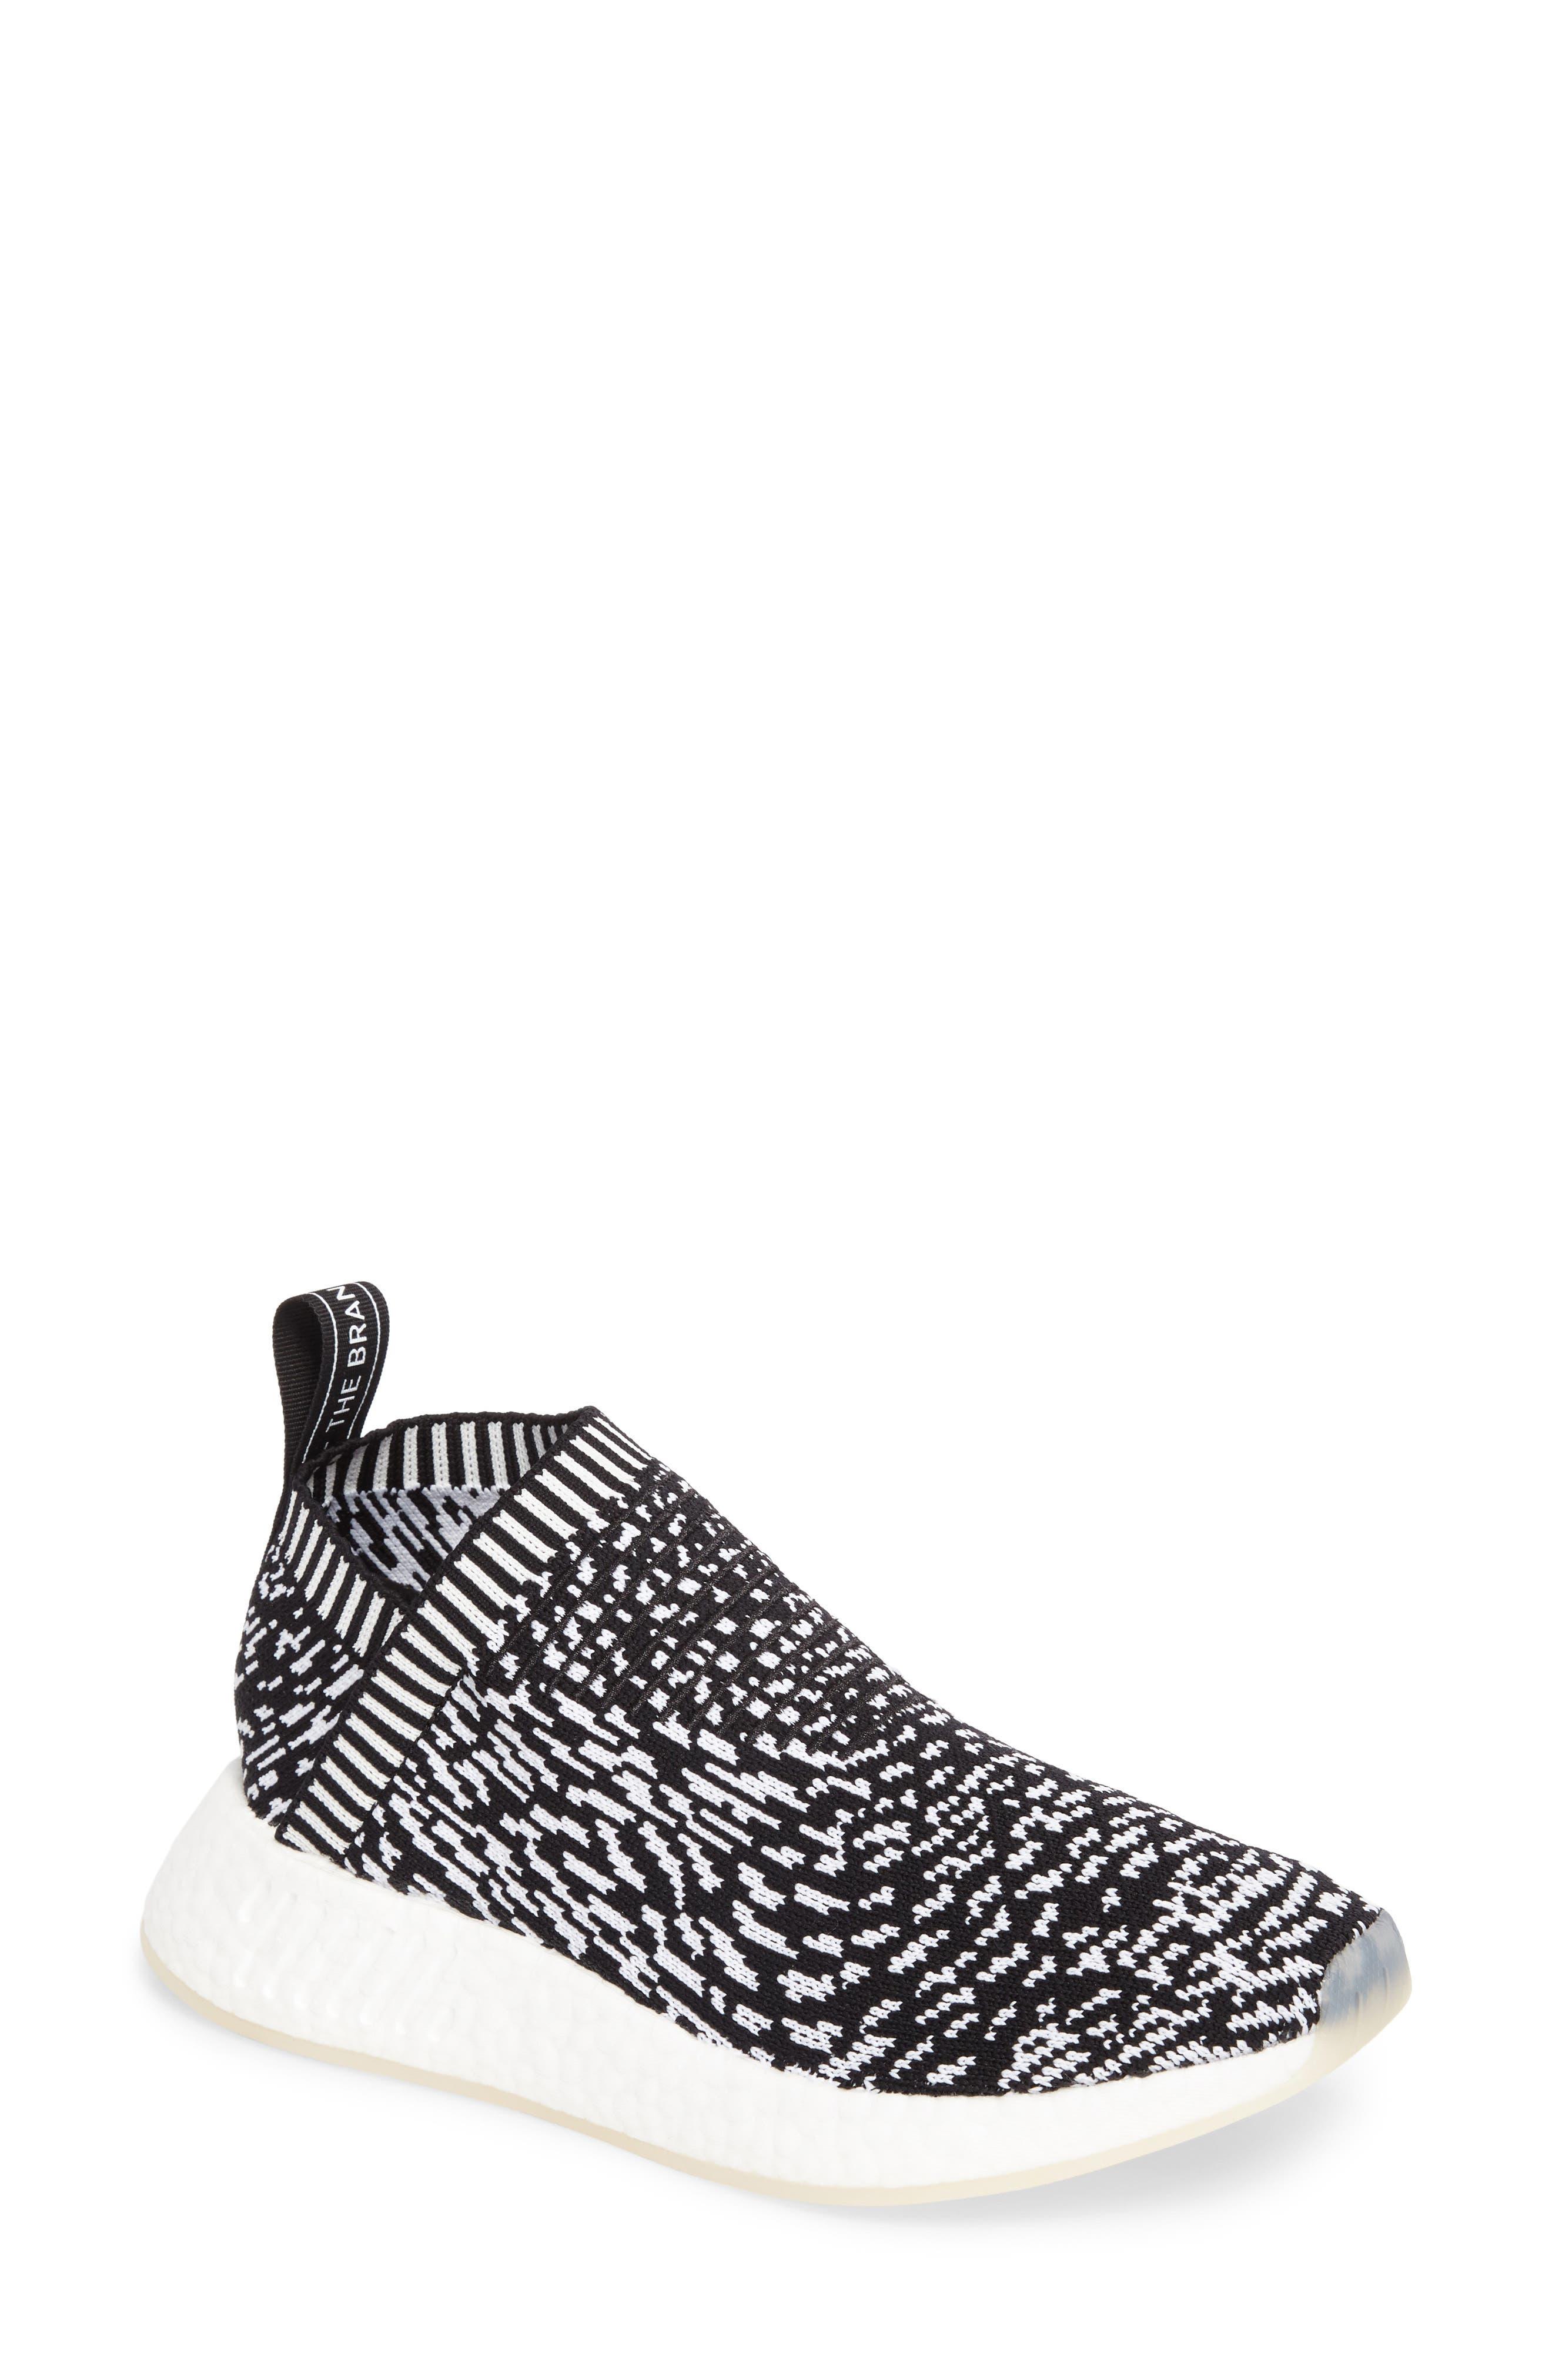 NMD_CS2 Primeknit Sneaker,                             Main thumbnail 1, color,                             001